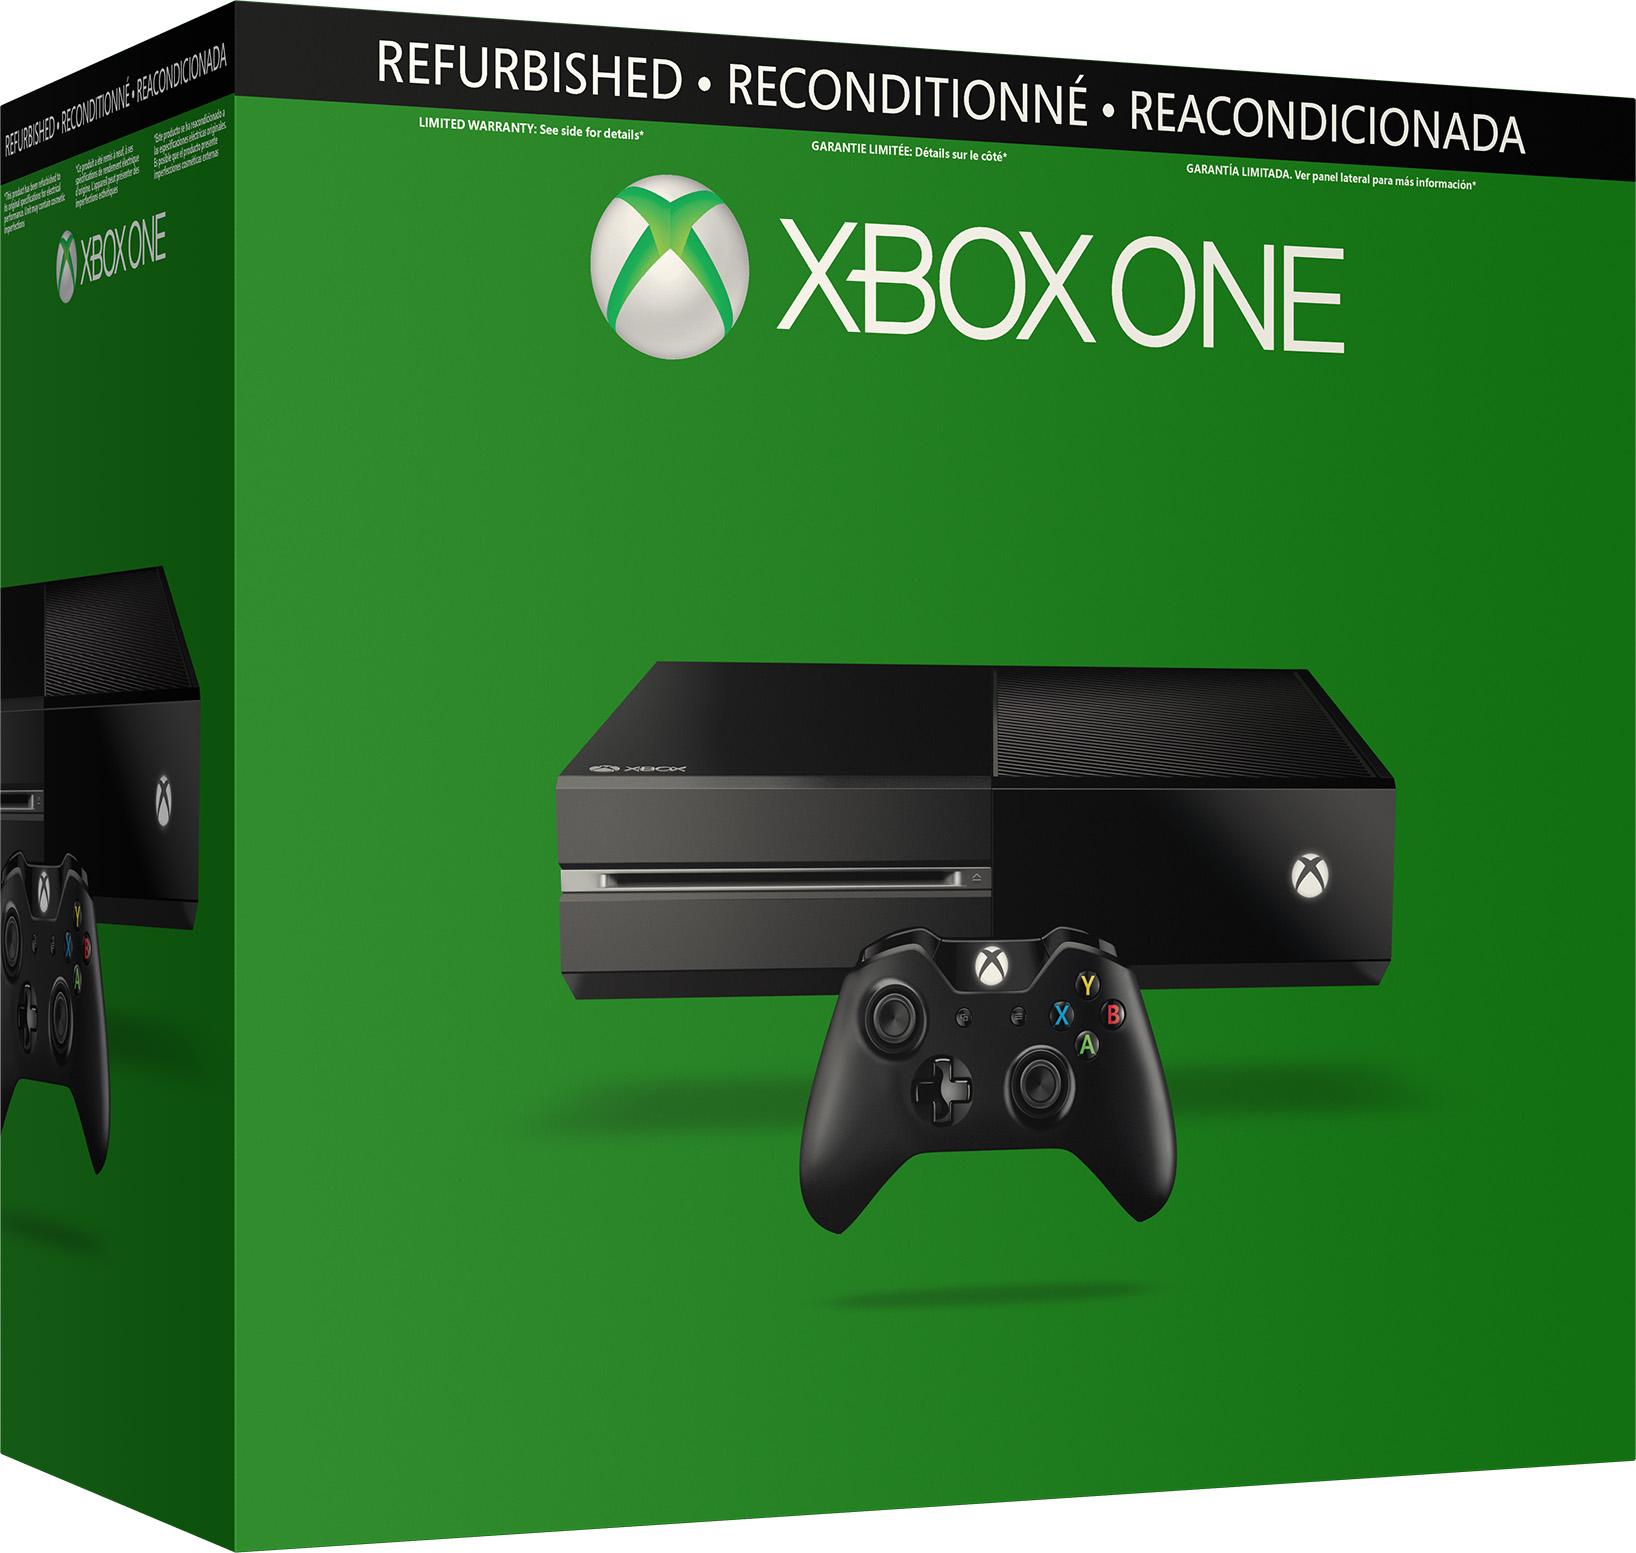 Refurbished Xbox One Console (500GB)